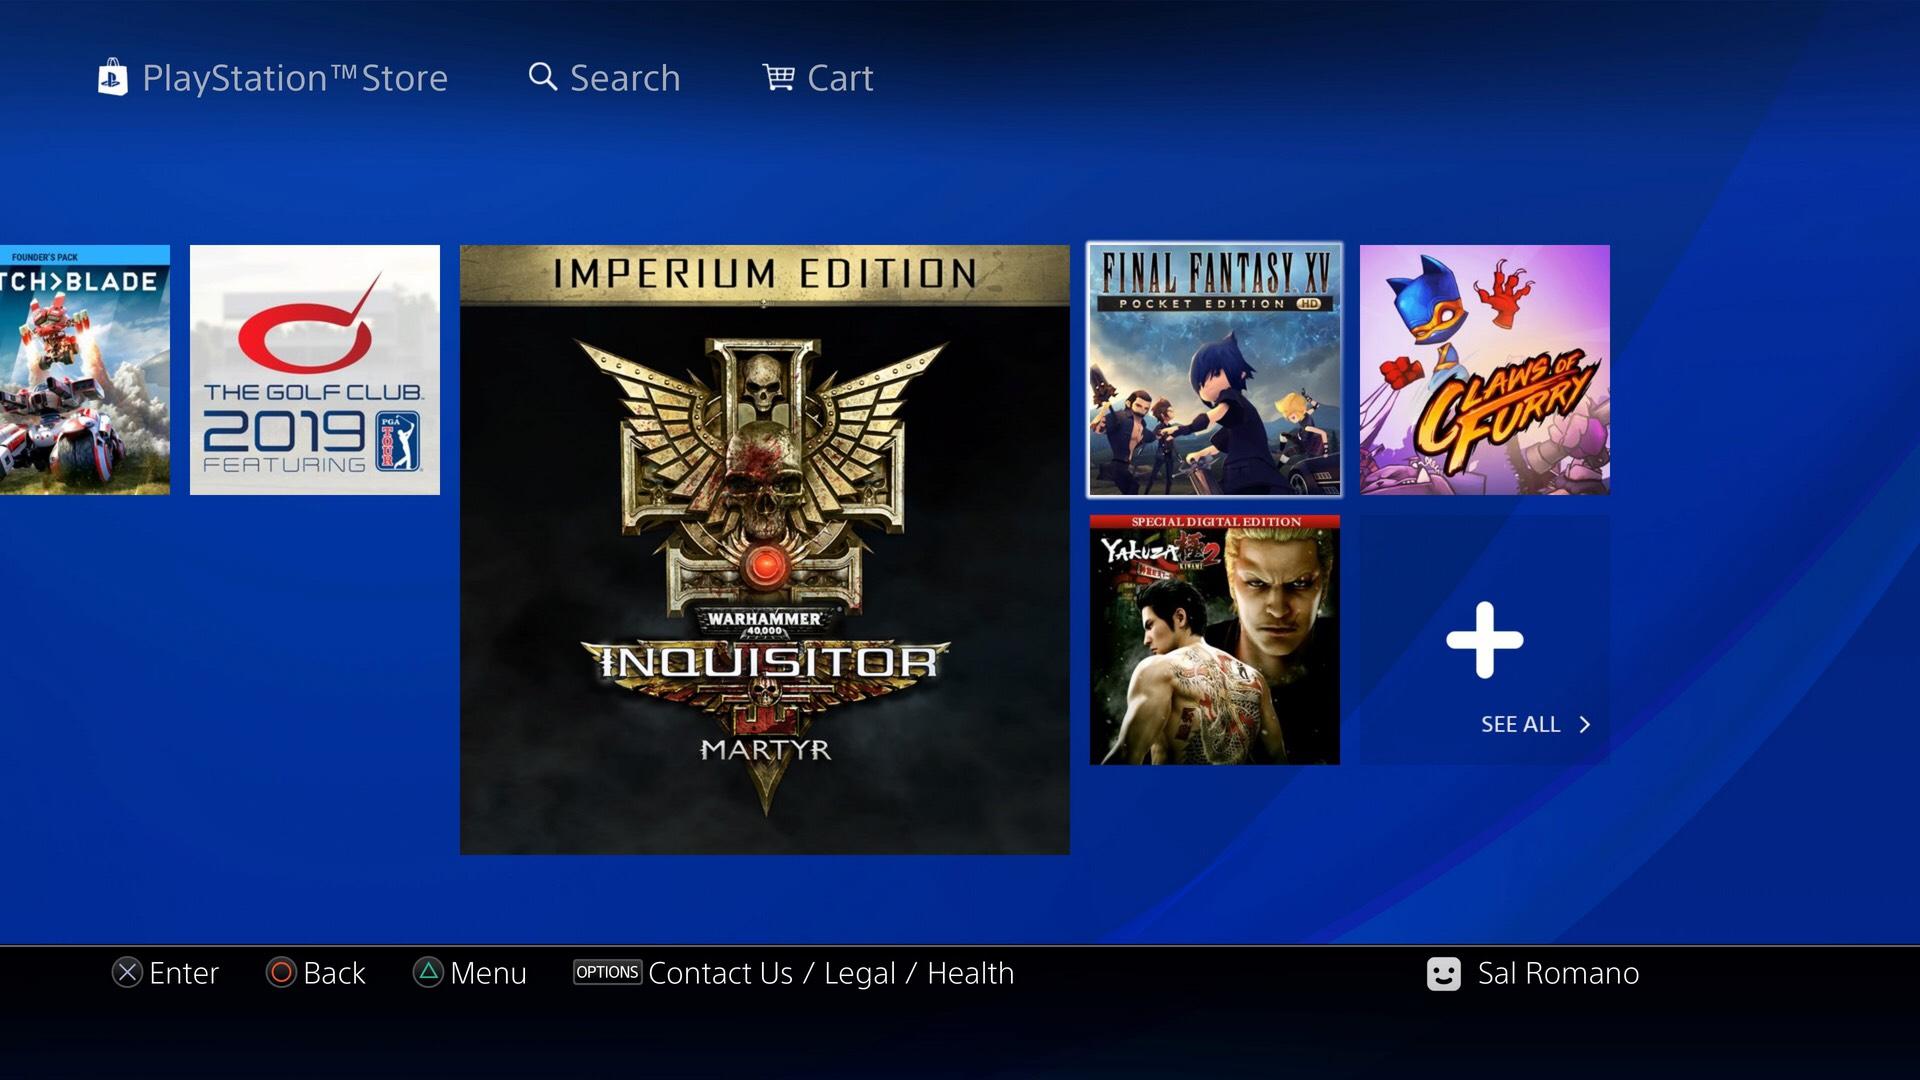 FFXV Pocket Edition HD PS Store - Final Fantasy XV: Pocket Edition HD appare su PS Store